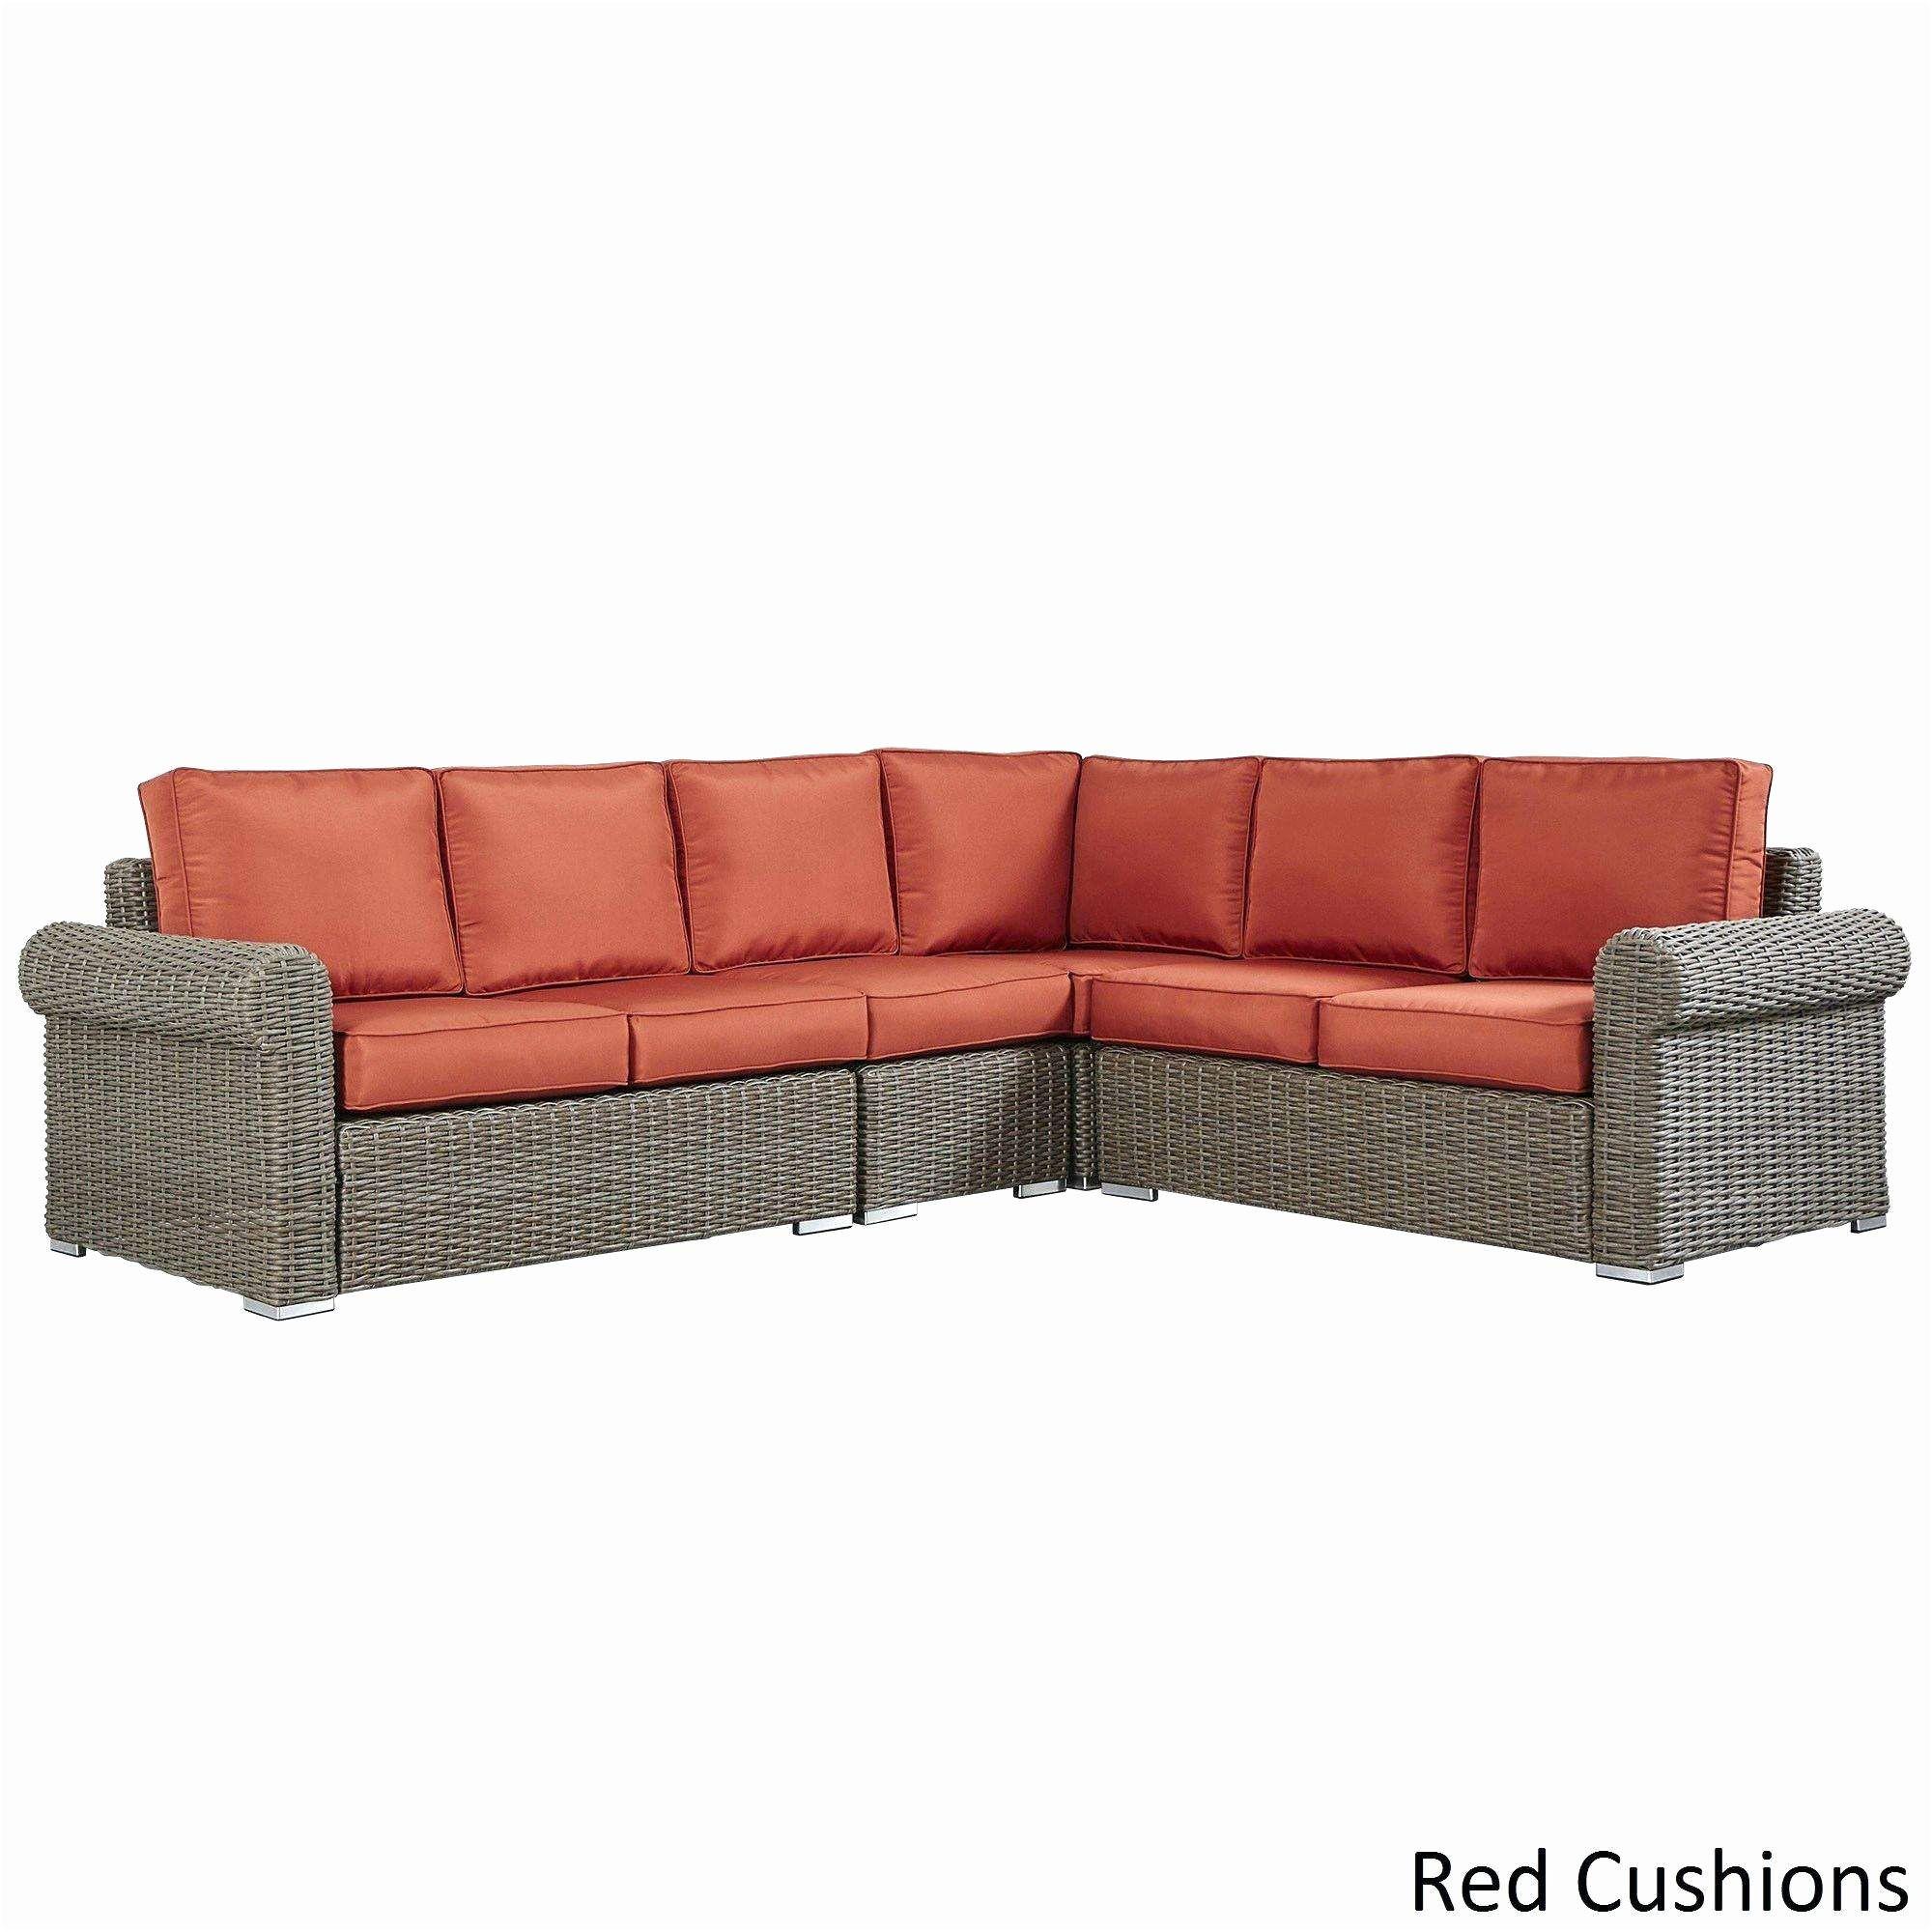 Hervorragend Big Sofa Halbrund Check More At Https Tridentbeauties